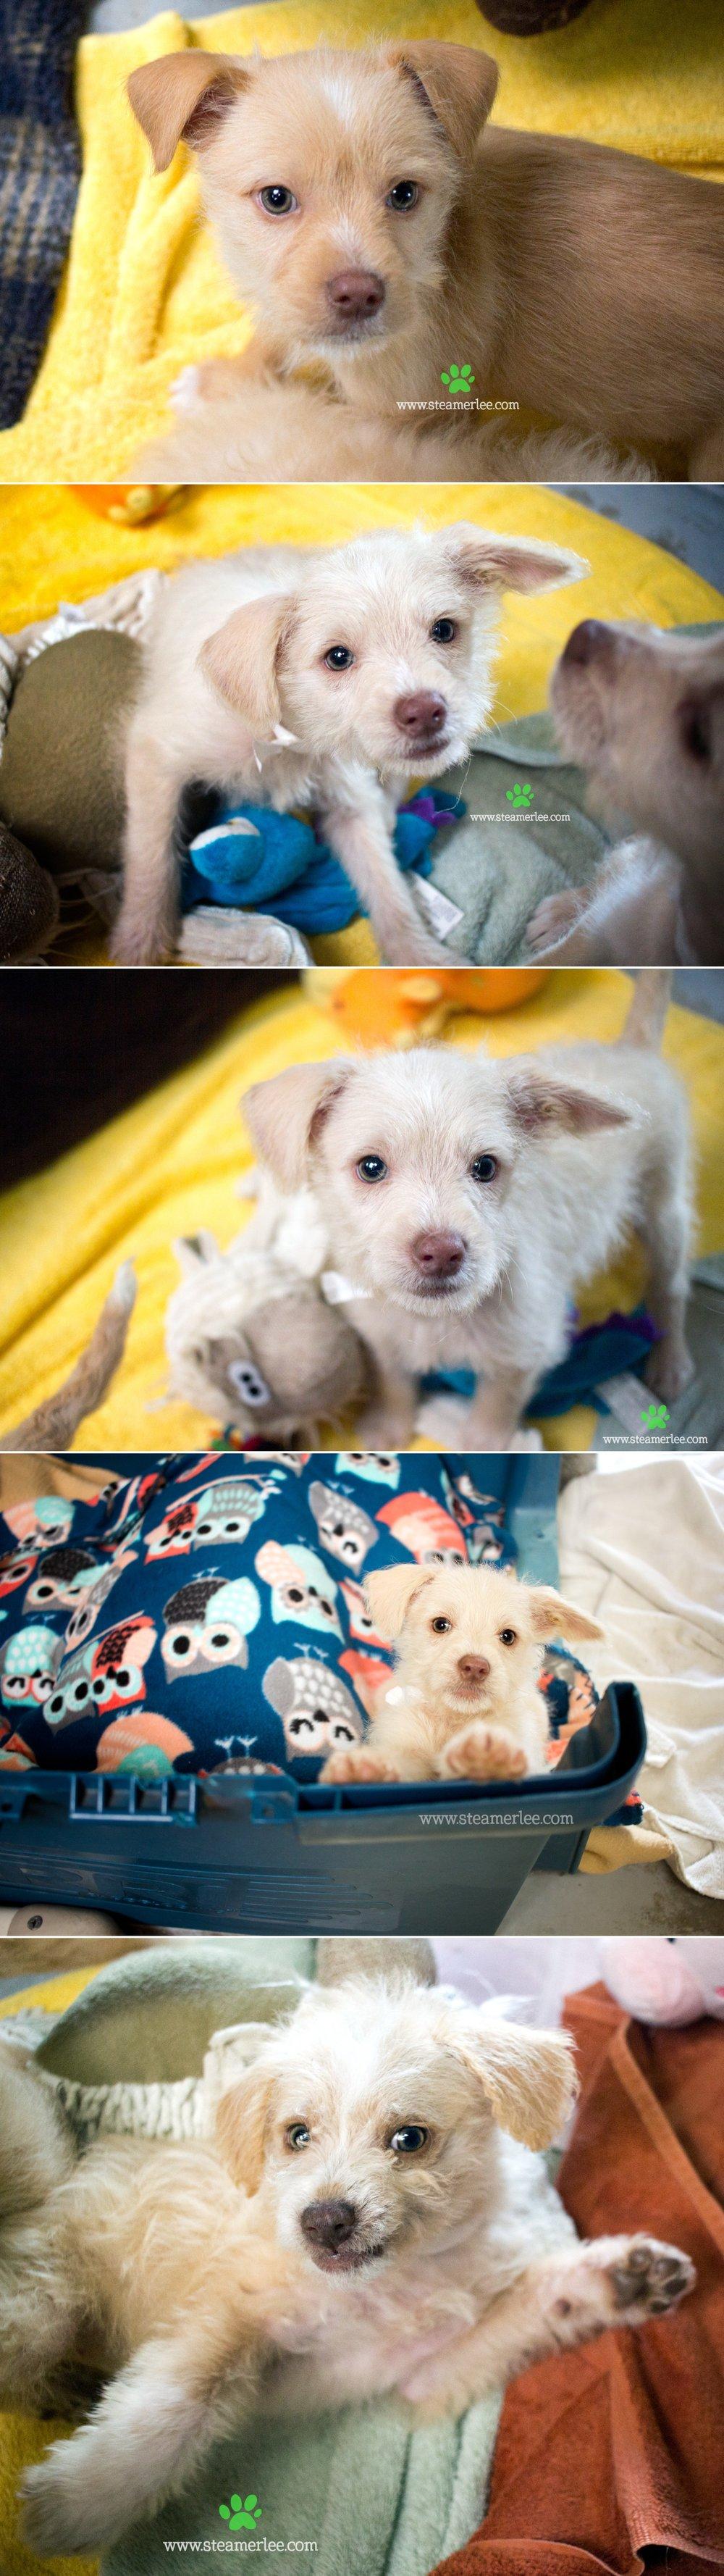 08 Steamer Lee Dog Photography - Seal Beach Animal Care Center.JPG